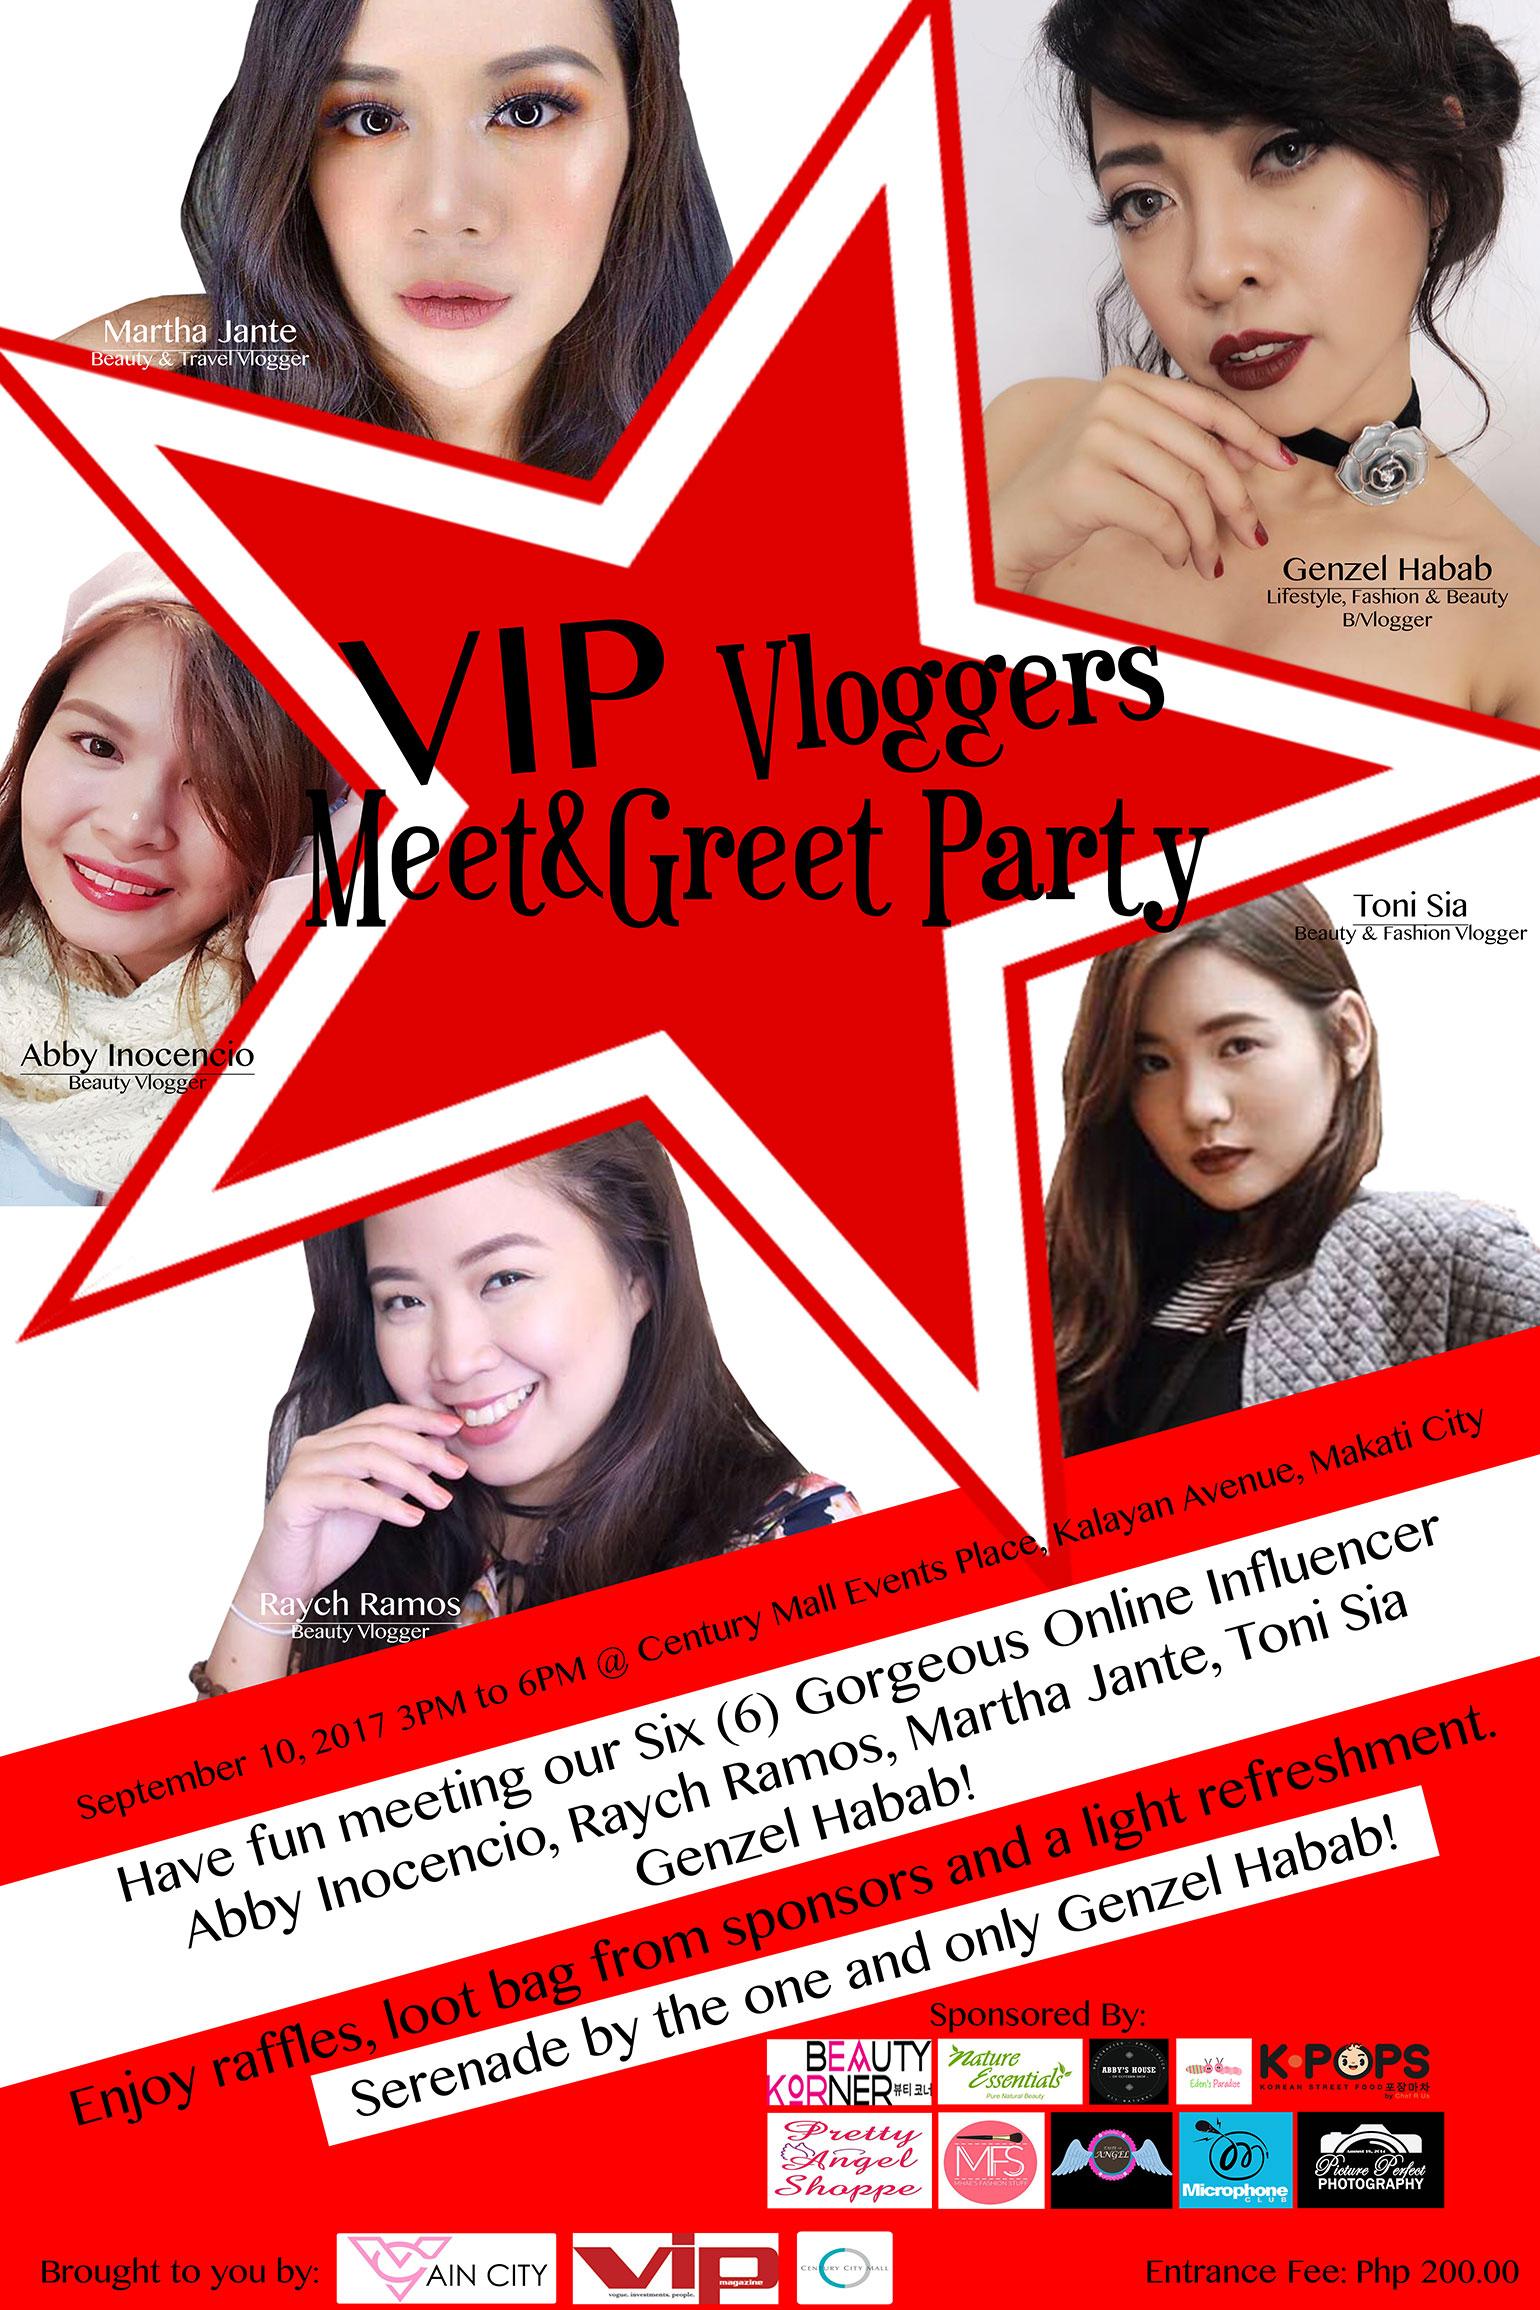 2 VIP Magazine - Vain City - VIP Vloggers Meet and Greet